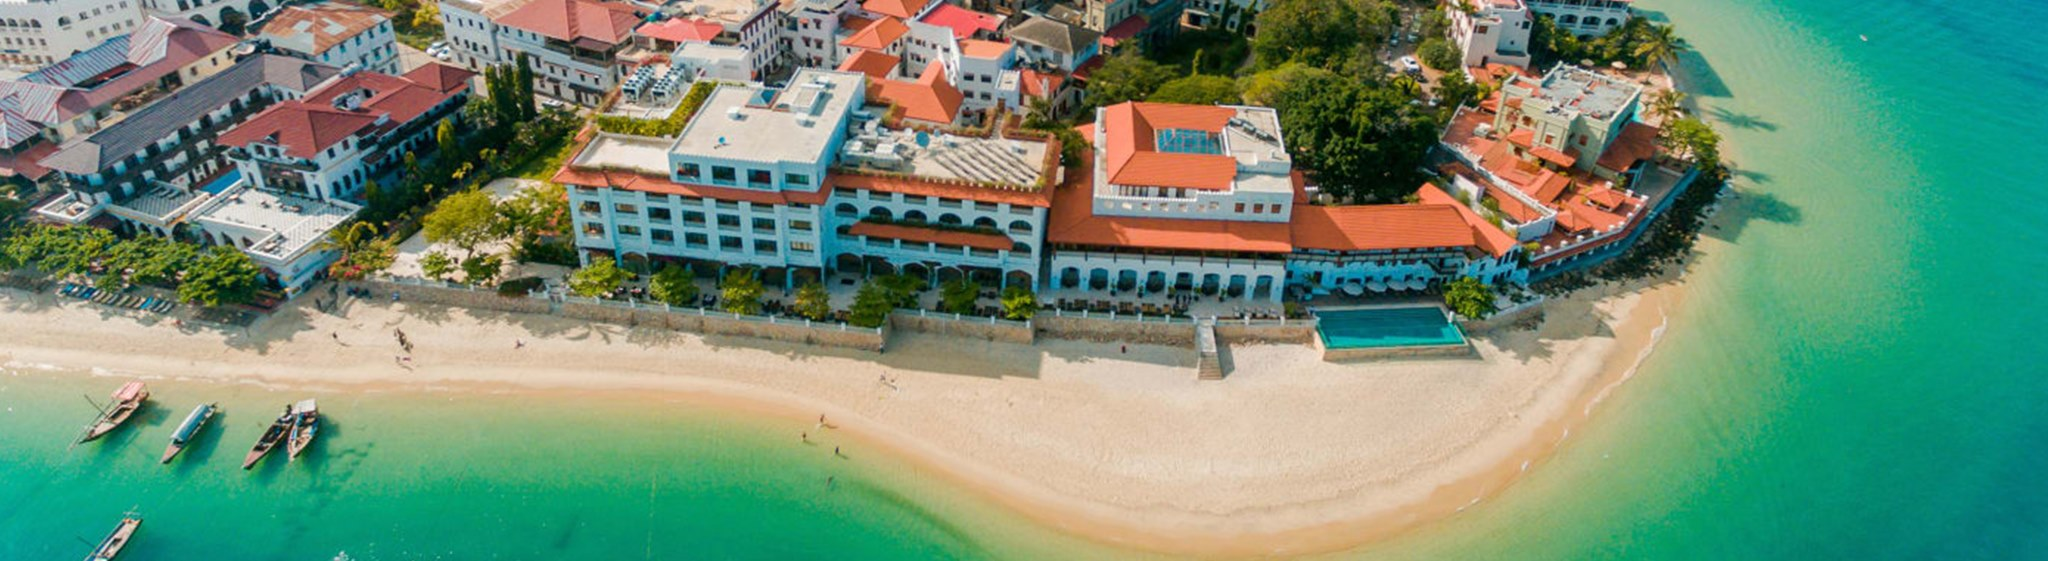 Antonio Garden Hotel - Safanta Tours & Travel Company Limited